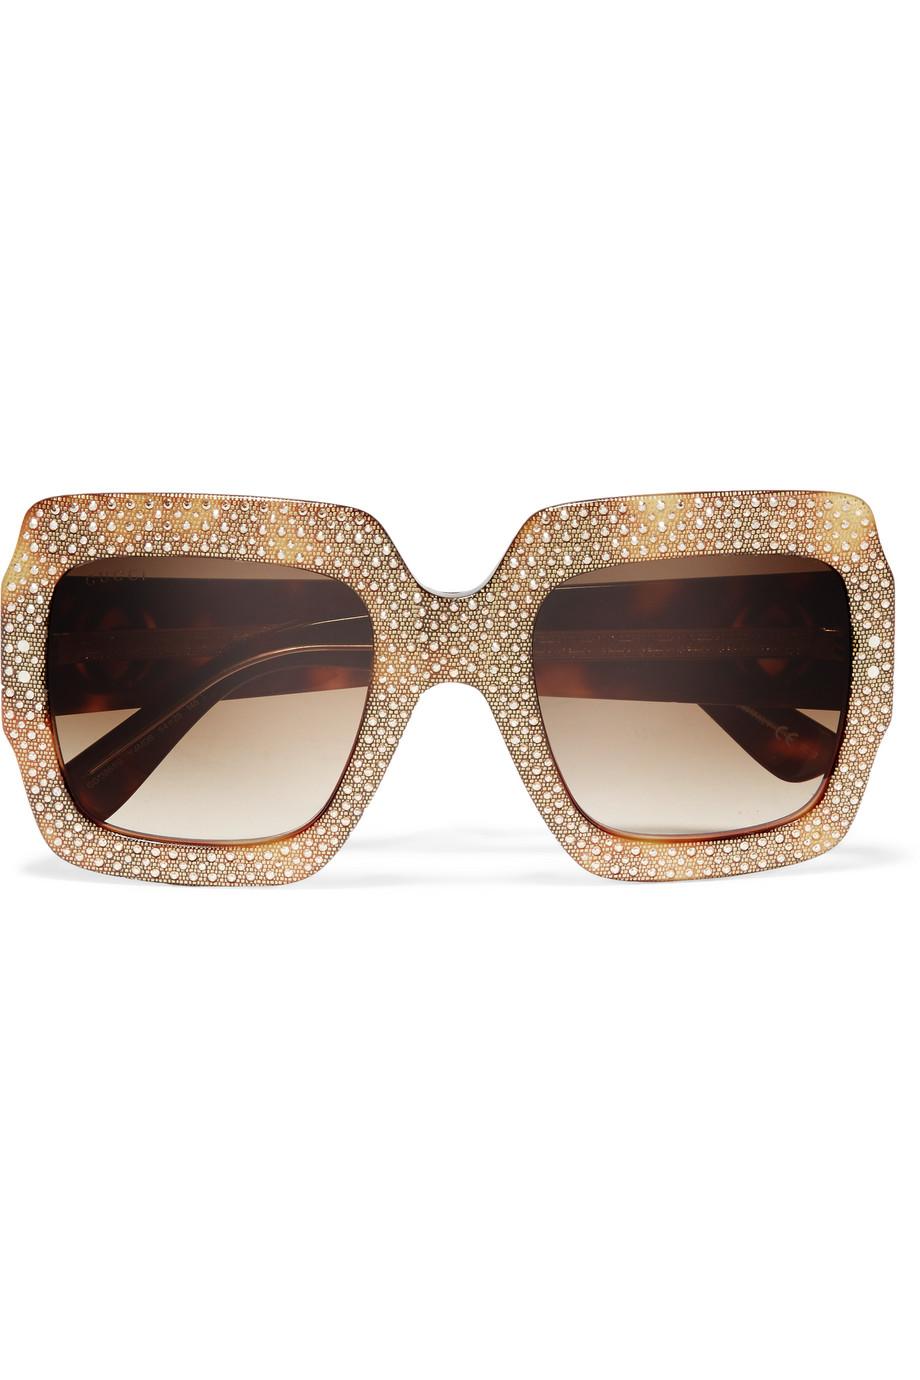 Gucci Square-Frame Crystal-Embellished Acetate Sunglasses, Tortoiseshell/Beige, Women's